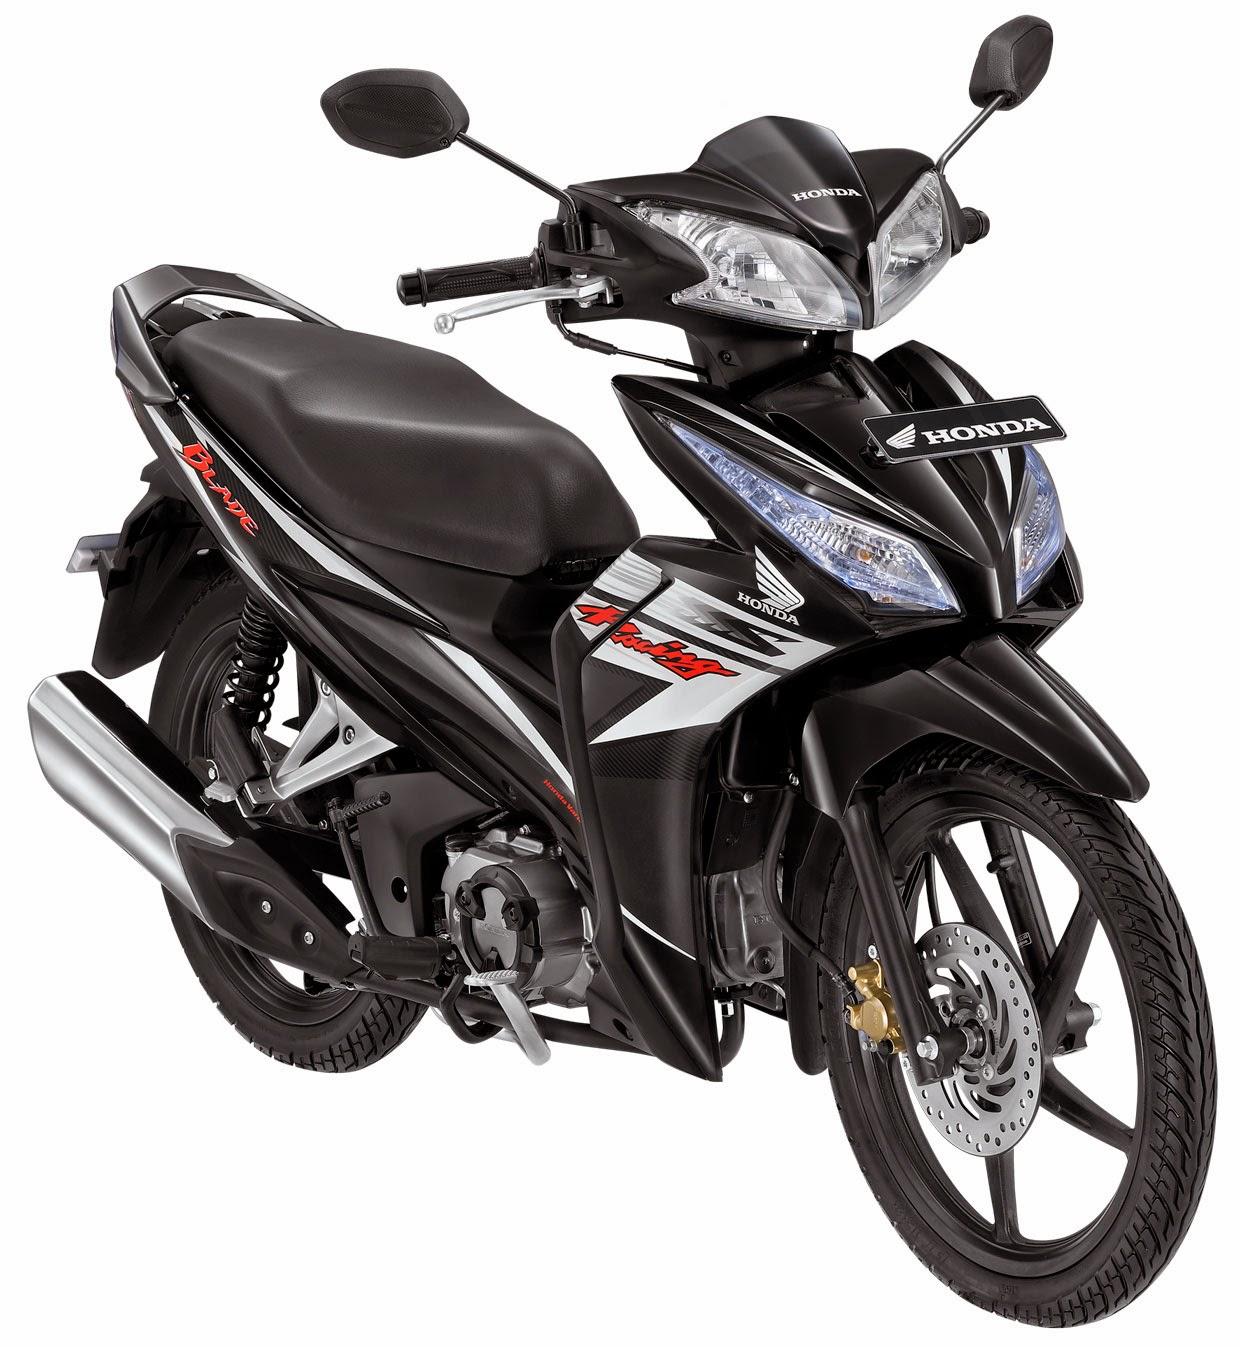 Modifikasi Motor Blade Cw  Thecitycyclist